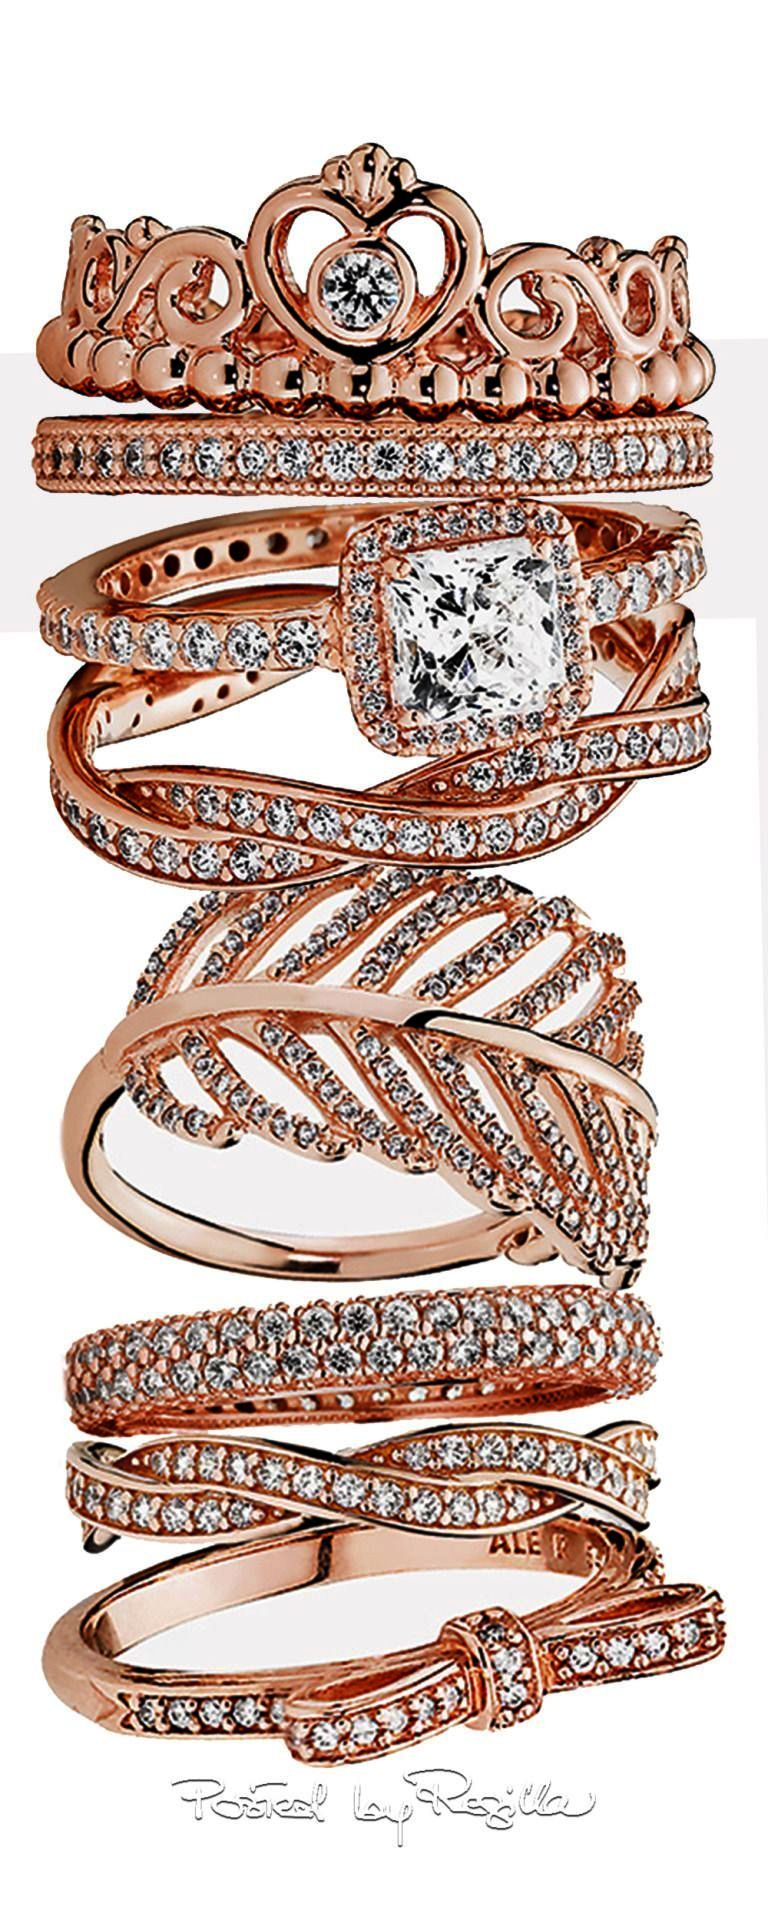 Excellent ueue pandora rings princess crown marvelous jewels and